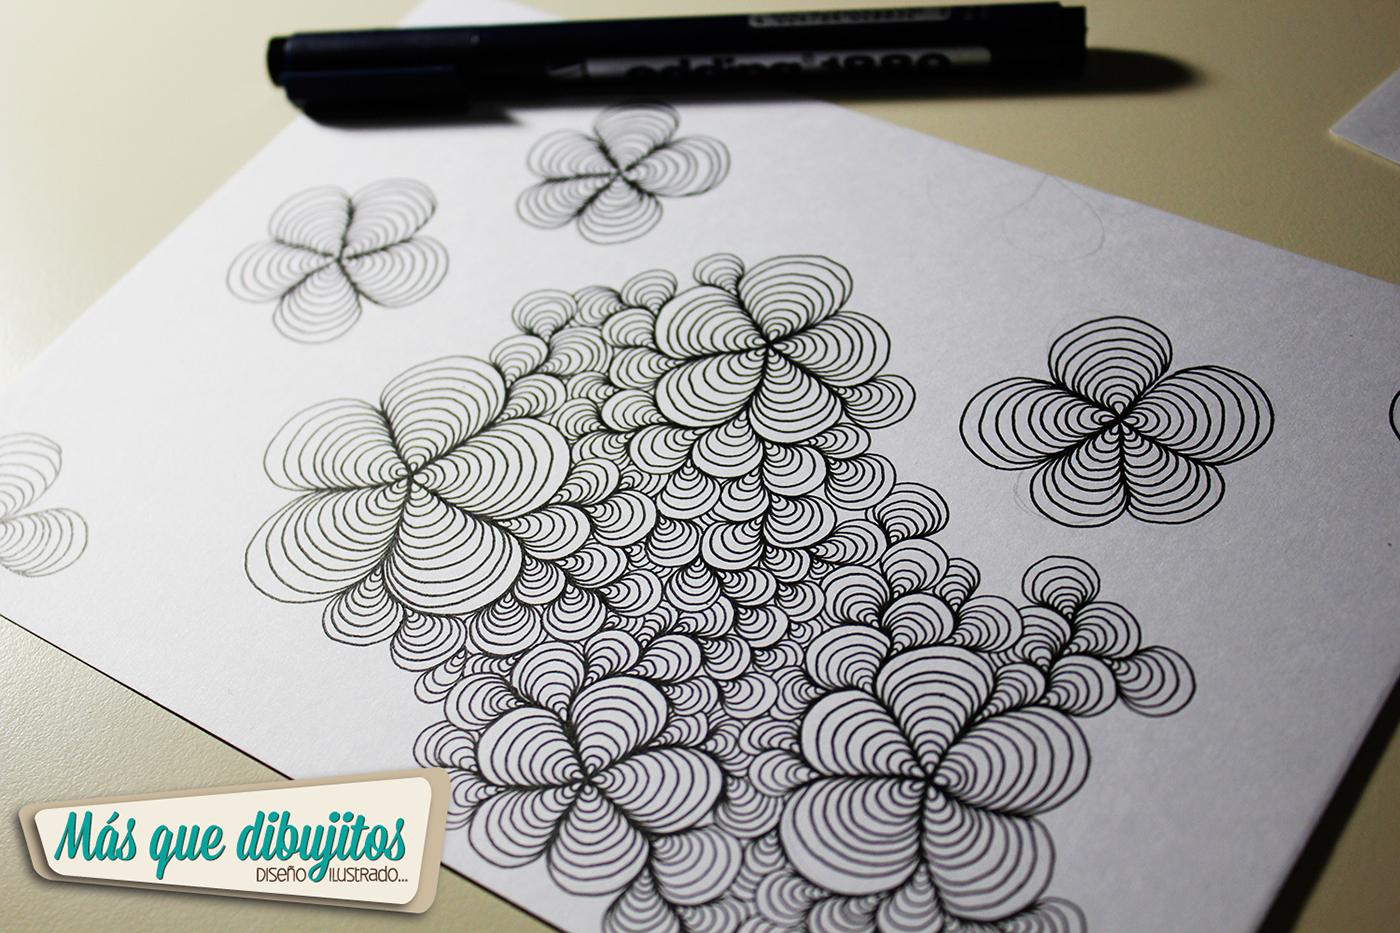 Como Hacer La Libreta De Dibujo De Marinetteprodigiosa: Proceso De Dibujo Para Tapa De Cuaderno On Behance